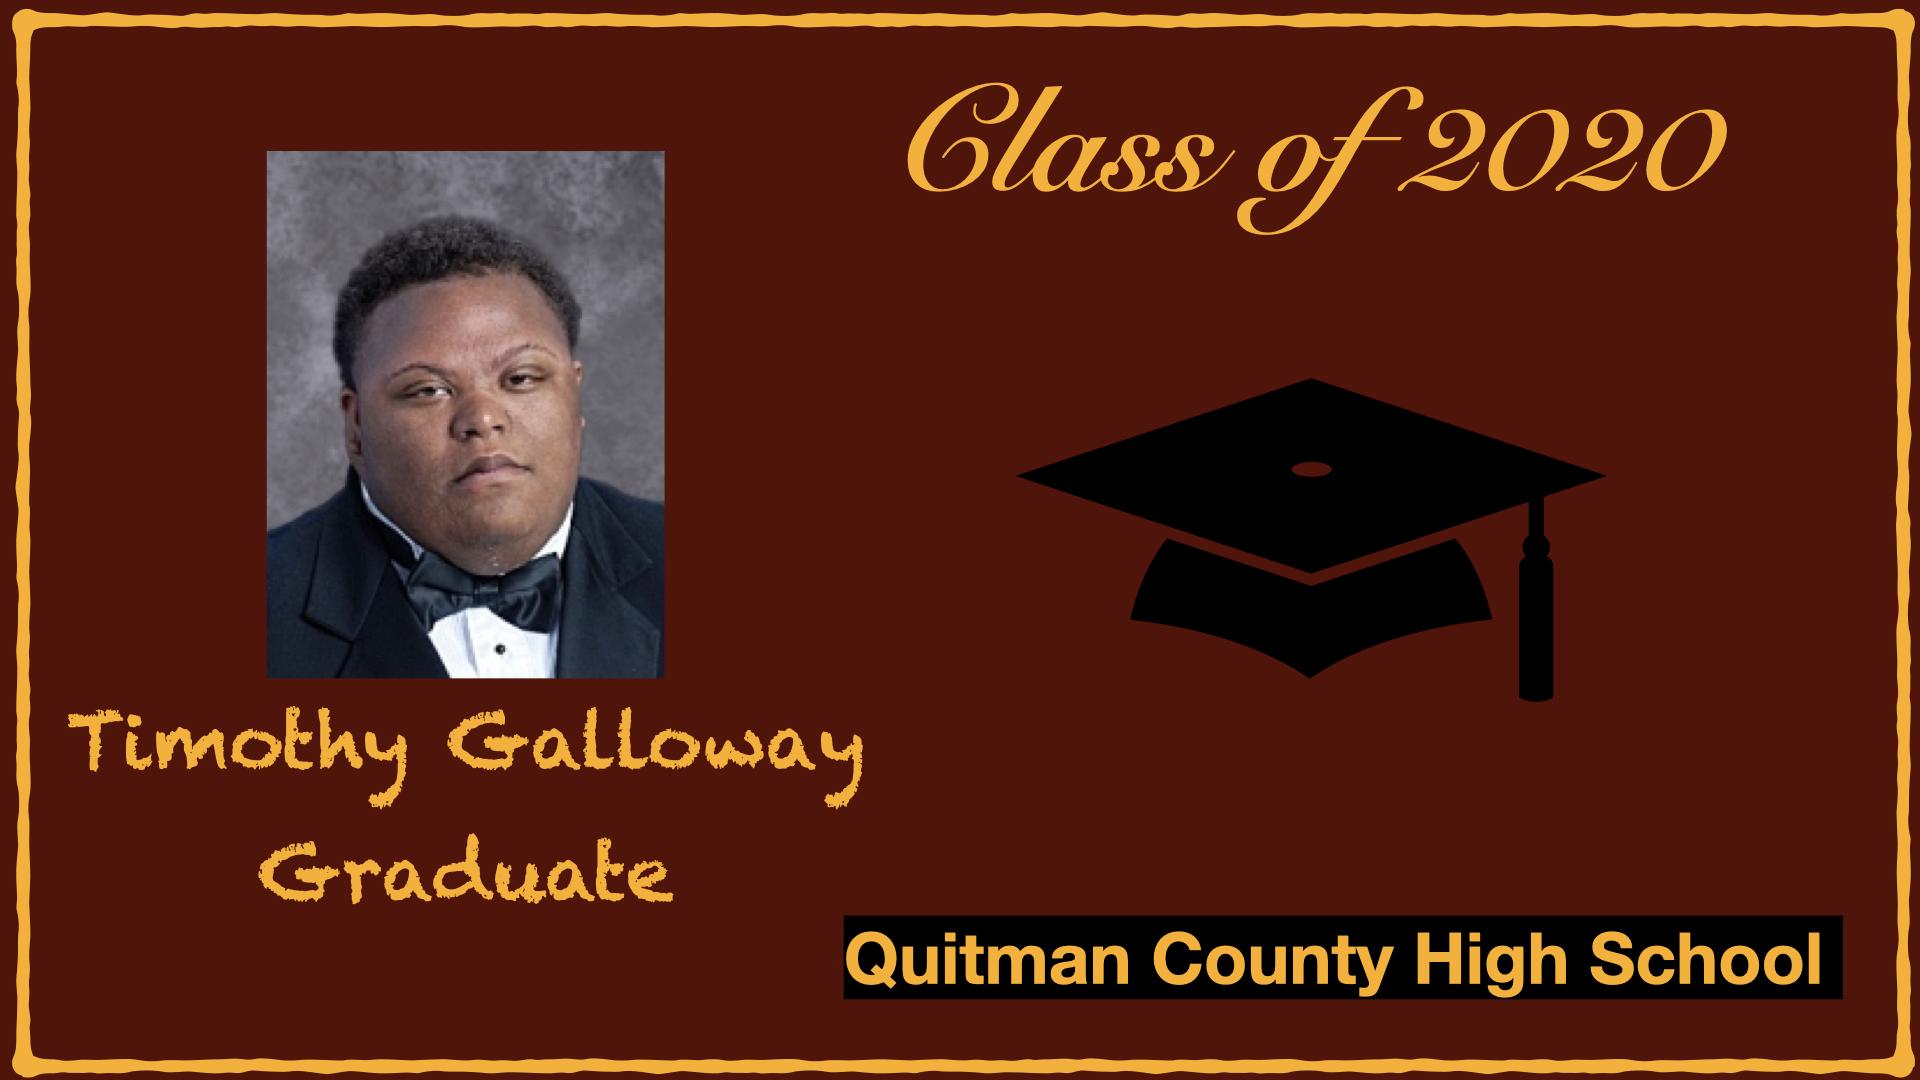 Timothy Galloway